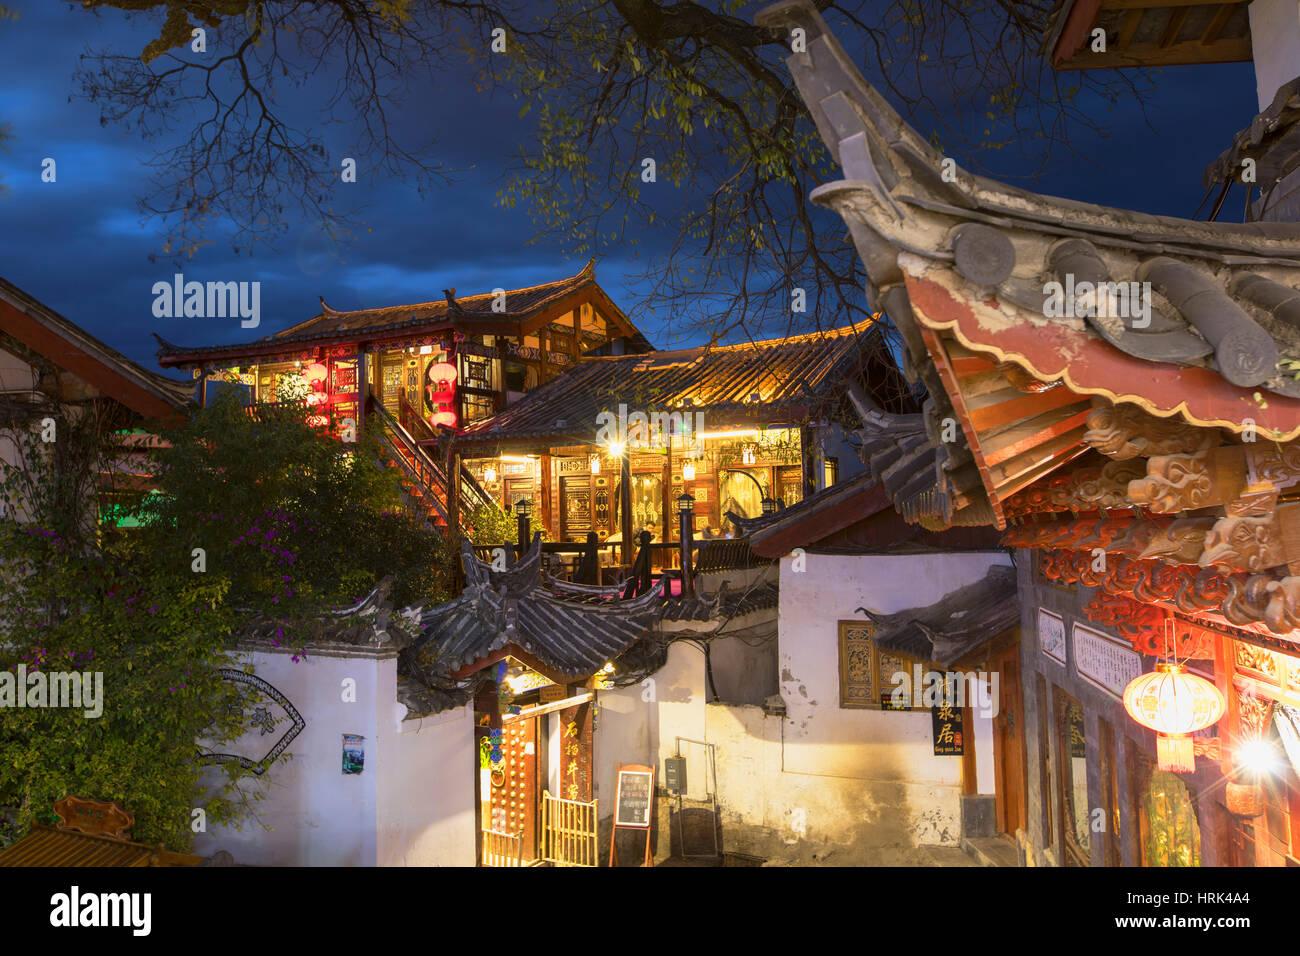 Gästehaus in der Abenddämmerung, Lijiang (UNESCO Weltkulturerbe), Yunnan, China Stockbild